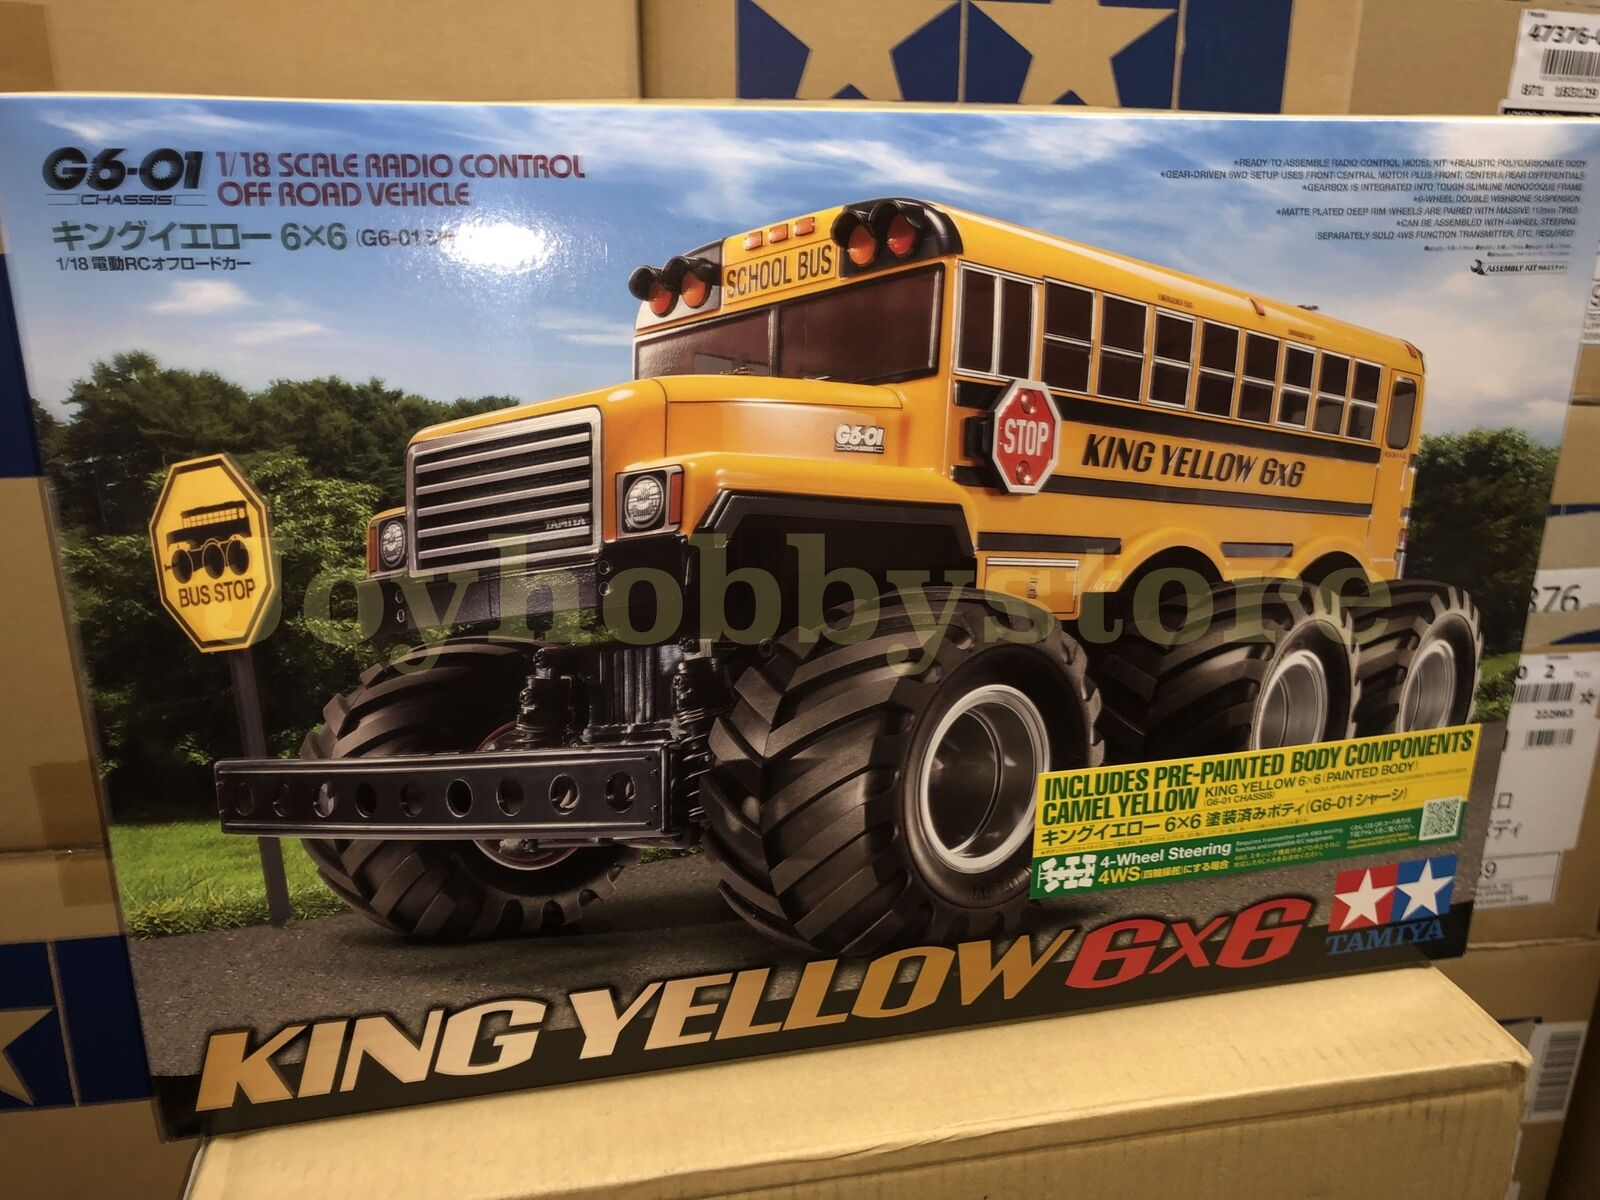 Tamiya 47376 1 18 RC re gituttio  School autoautobus 6X6 G6-01 Painted corpo Off strada Kit  Miglior prezzo